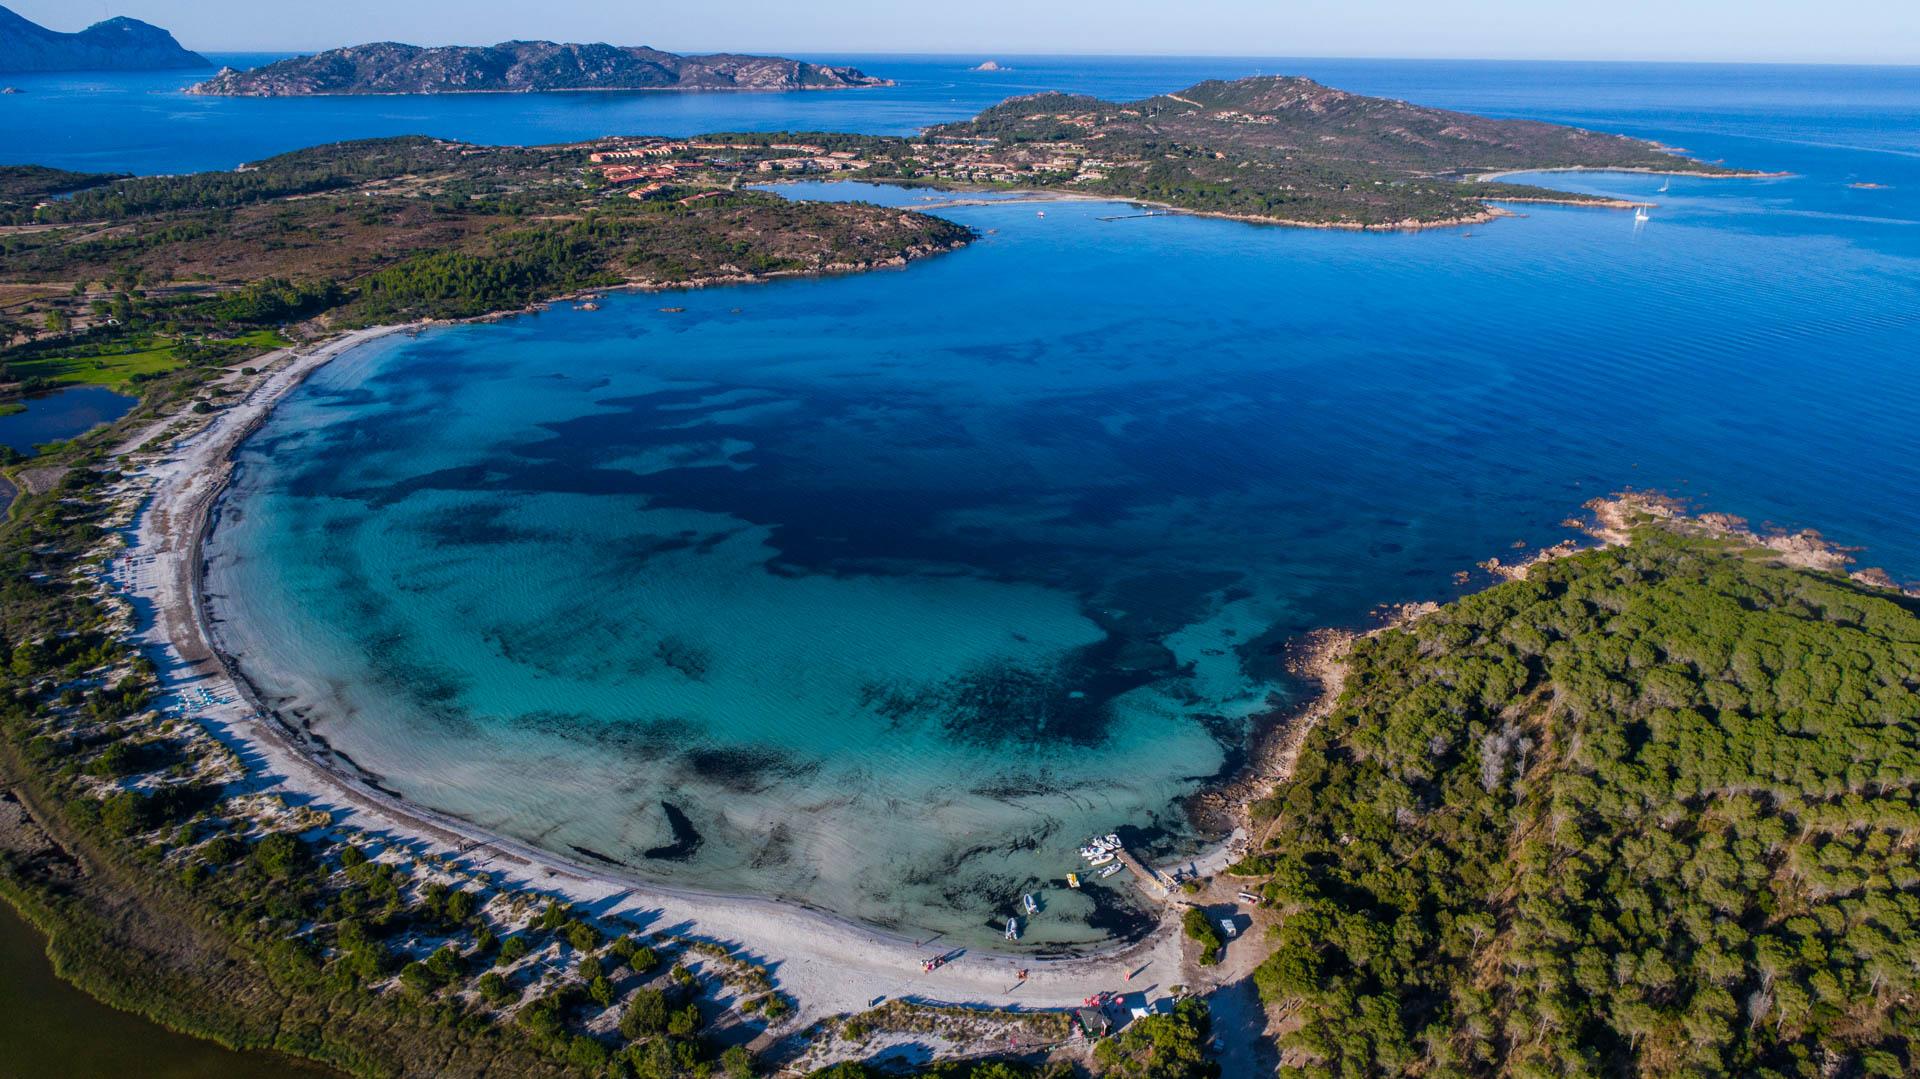 Cala Brandinchi 2 Sardinia Aerial Photography drone Enrico Pescantini